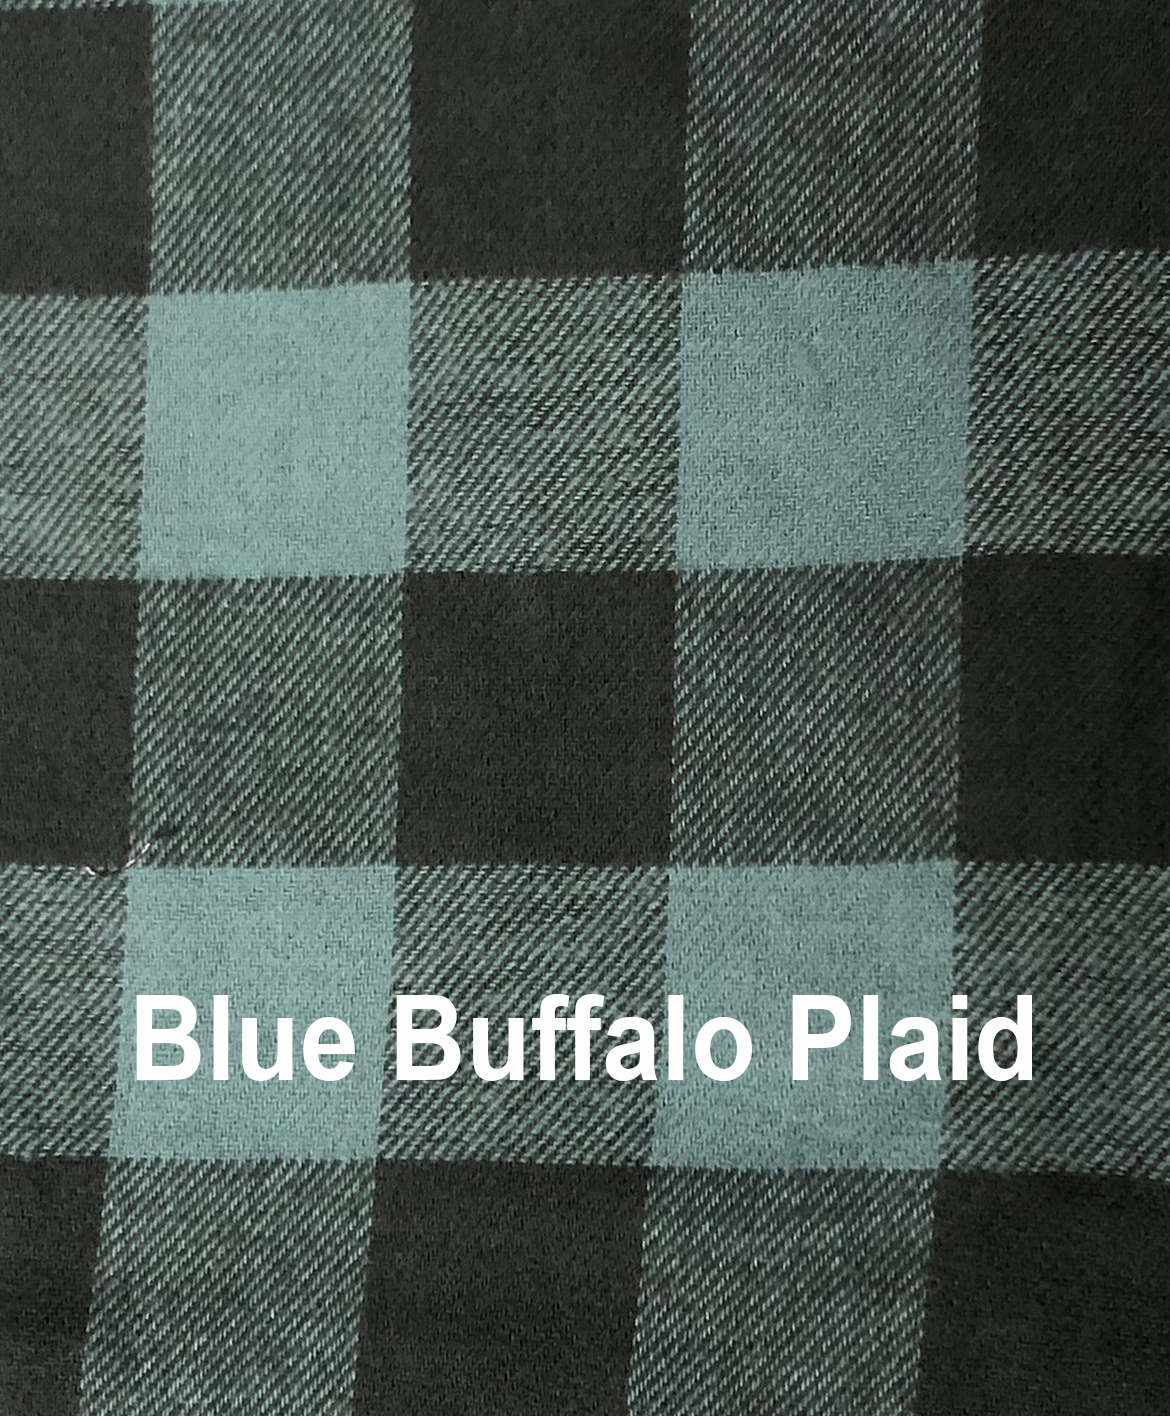 Blue-Buffalo-Plaid-BigCamo-Big-Tall-Shirt-Flannel-Dickies